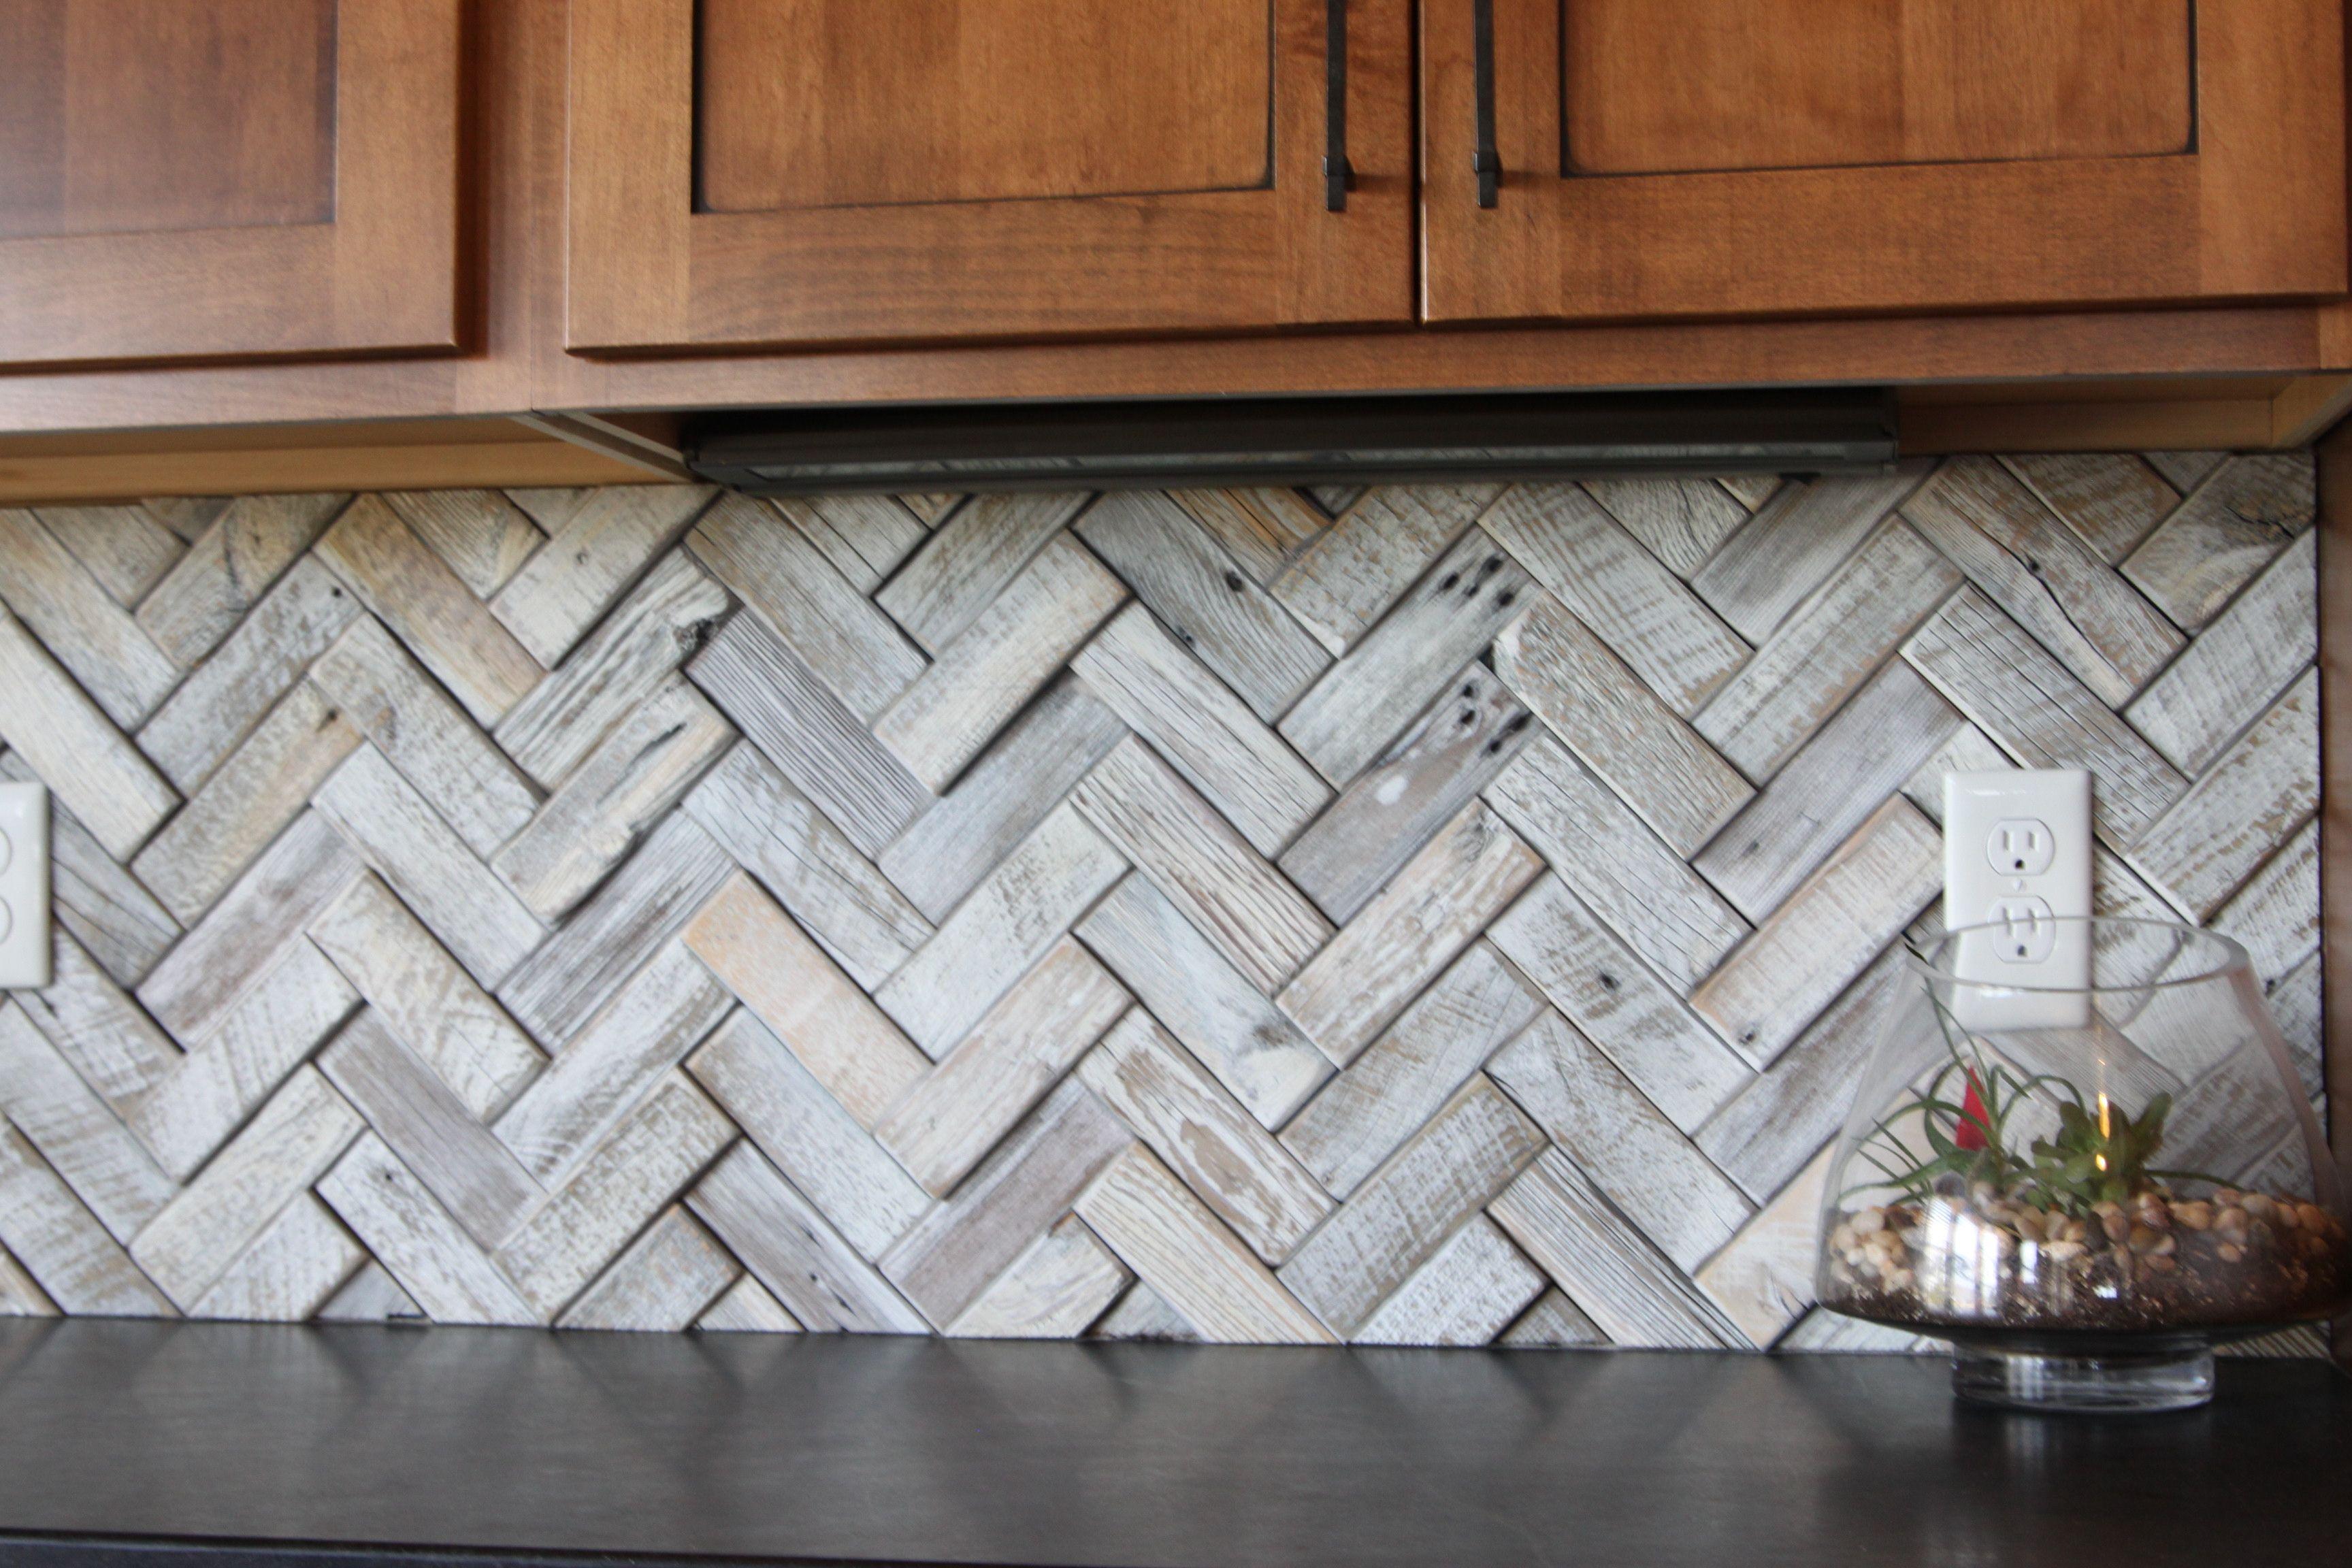 herringbone backsplash subway tile backsplash patterns and